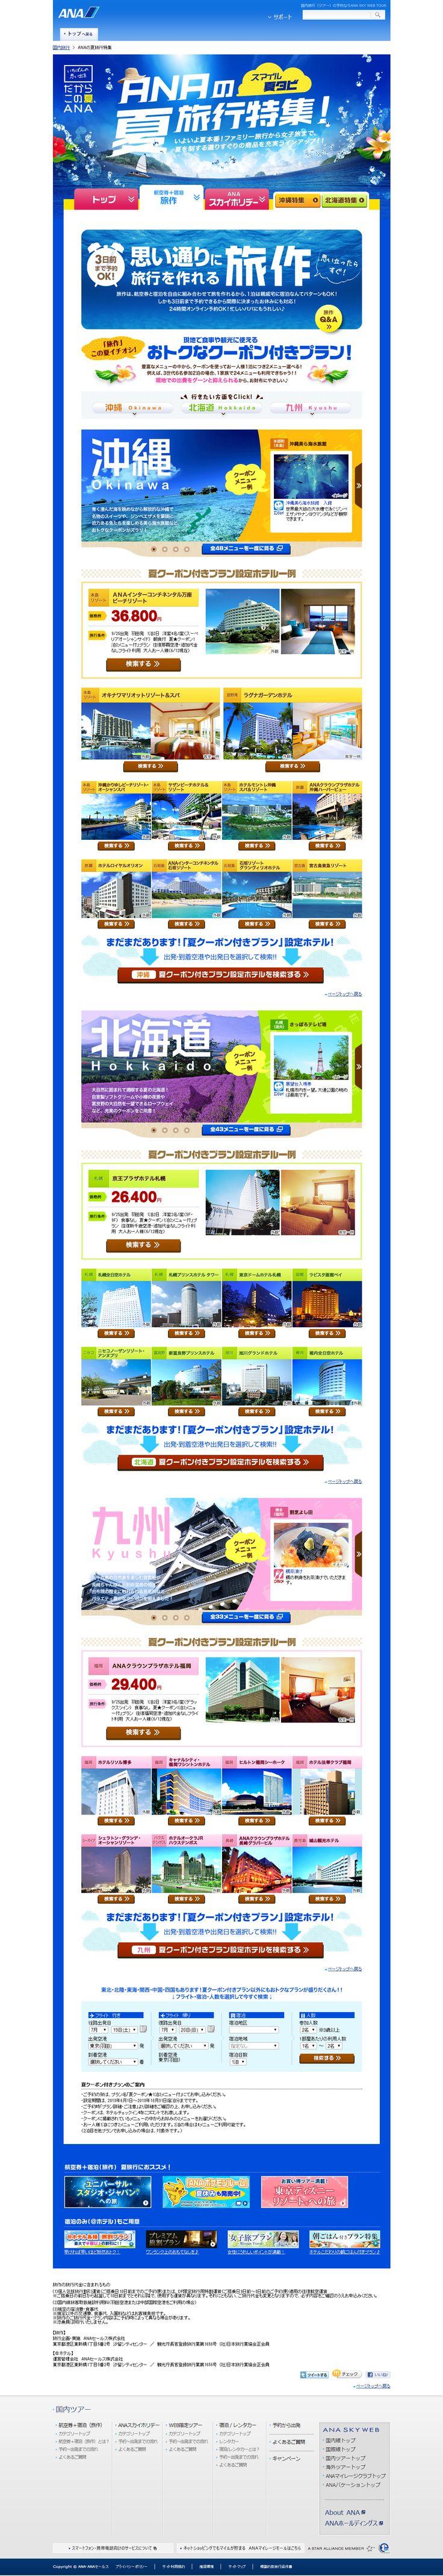 ANAの夏旅行特集|国内旅行(ツアー)|ANA SKY WEB TOUR